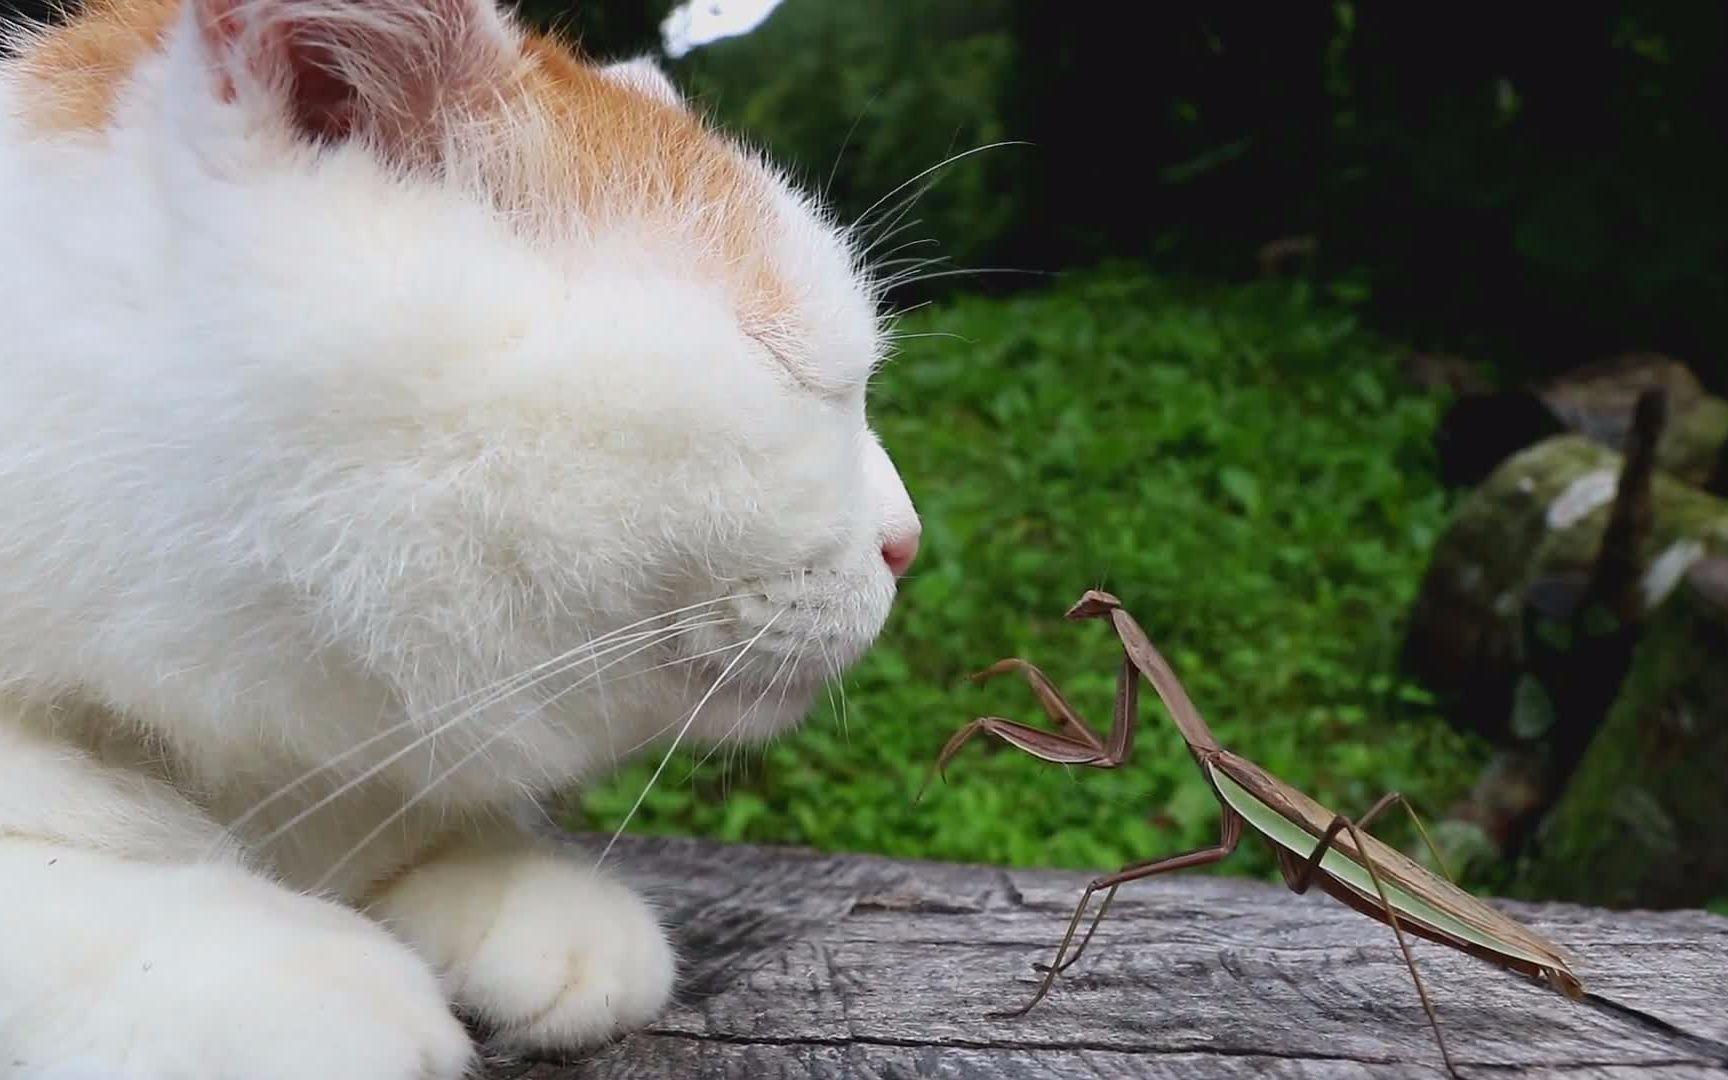 wwwa片con_vs螳螂,稳如泰山,图片尺寸:1728×1080,来自网页:http://www.